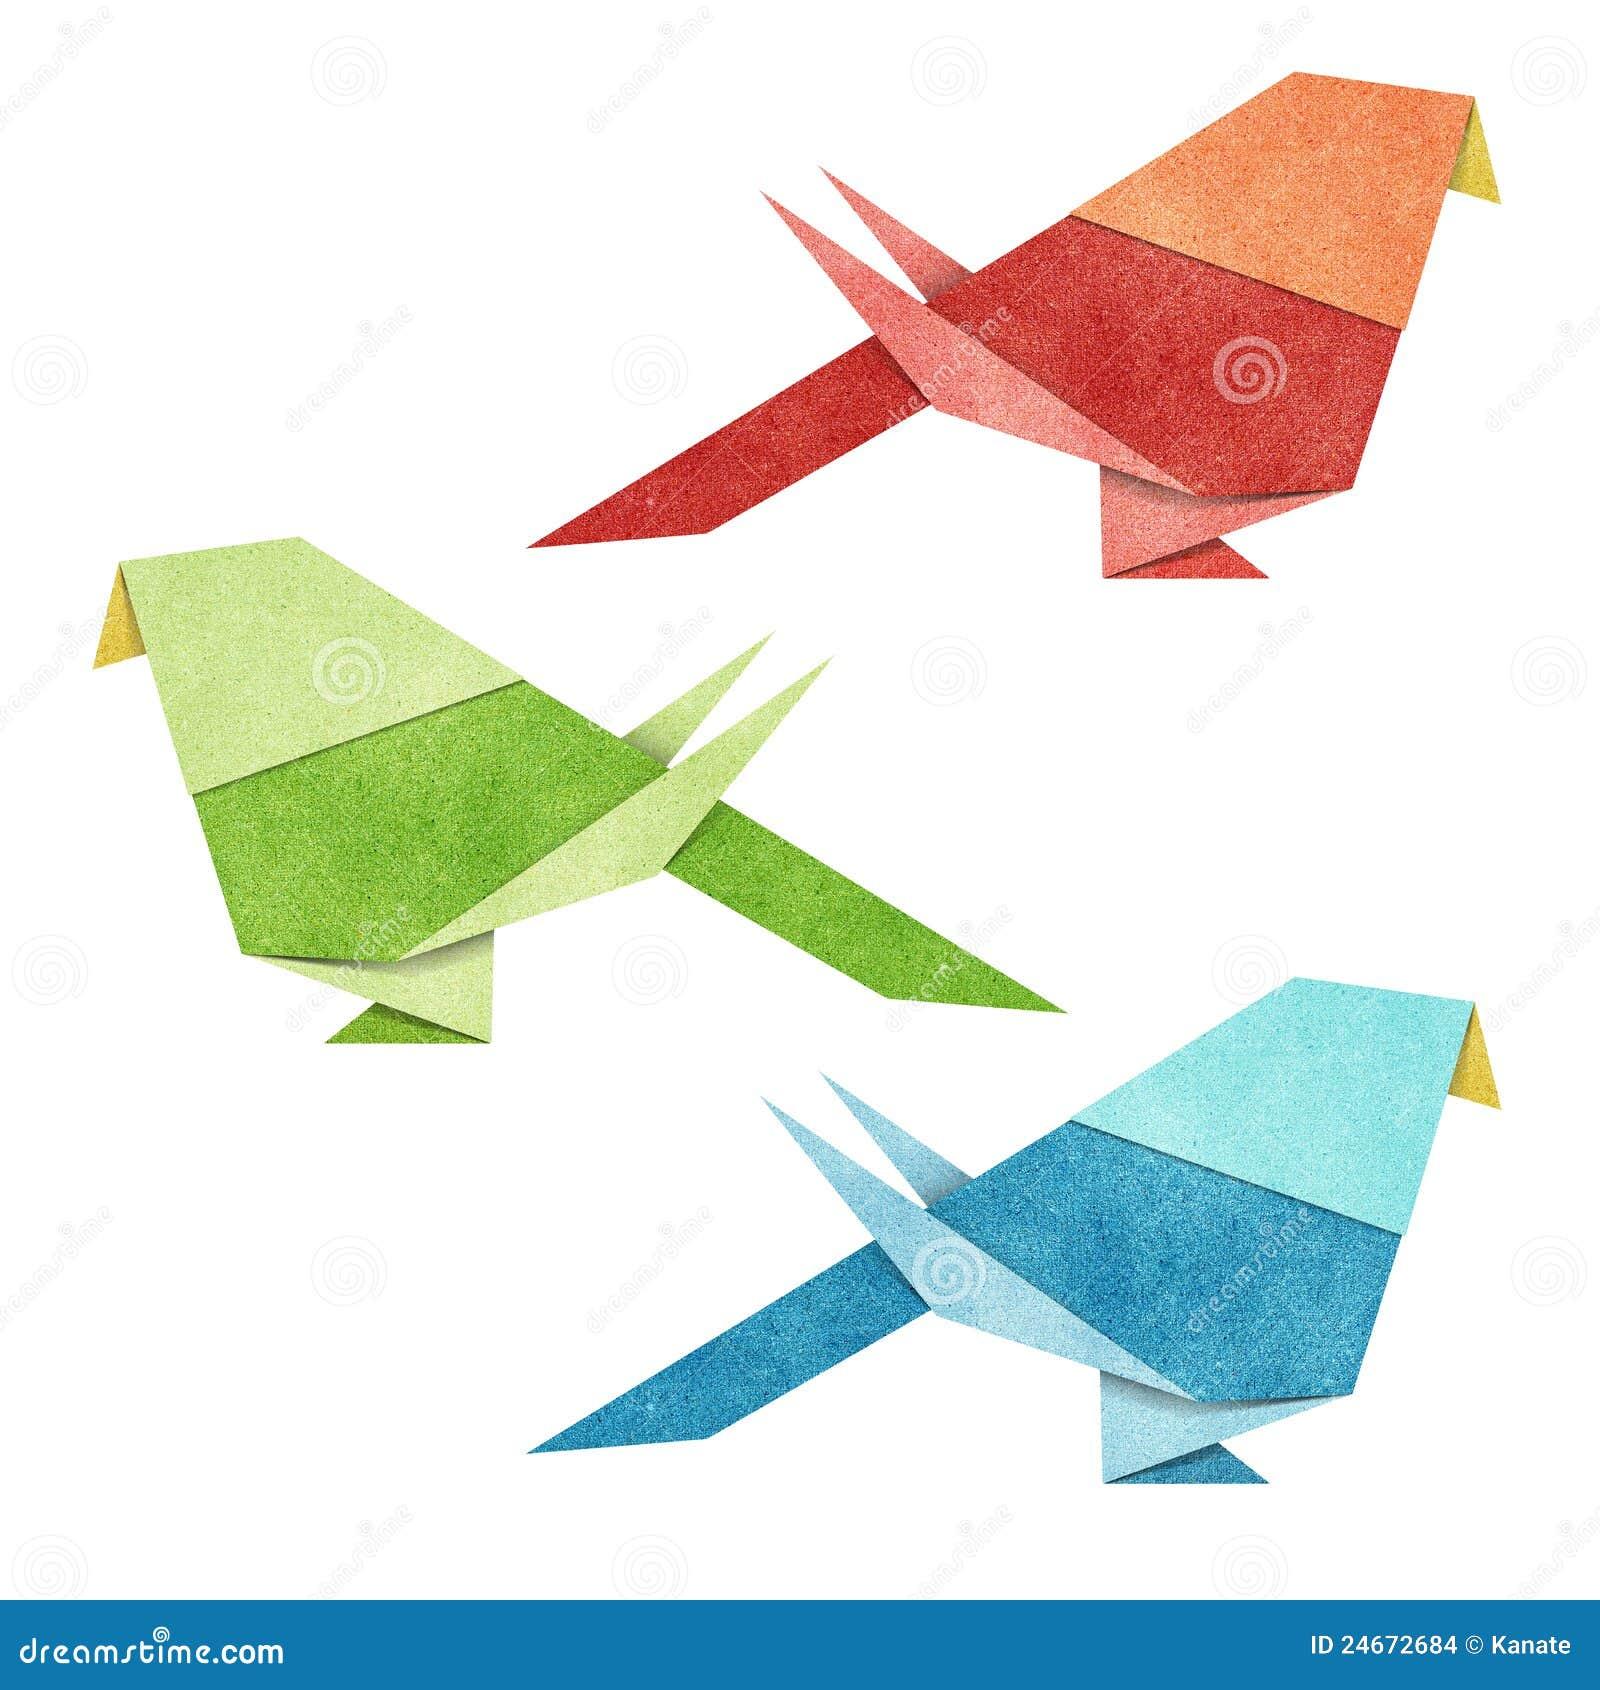 Origami Bird Recycle Papercraft Stock Images - Image: 24672684